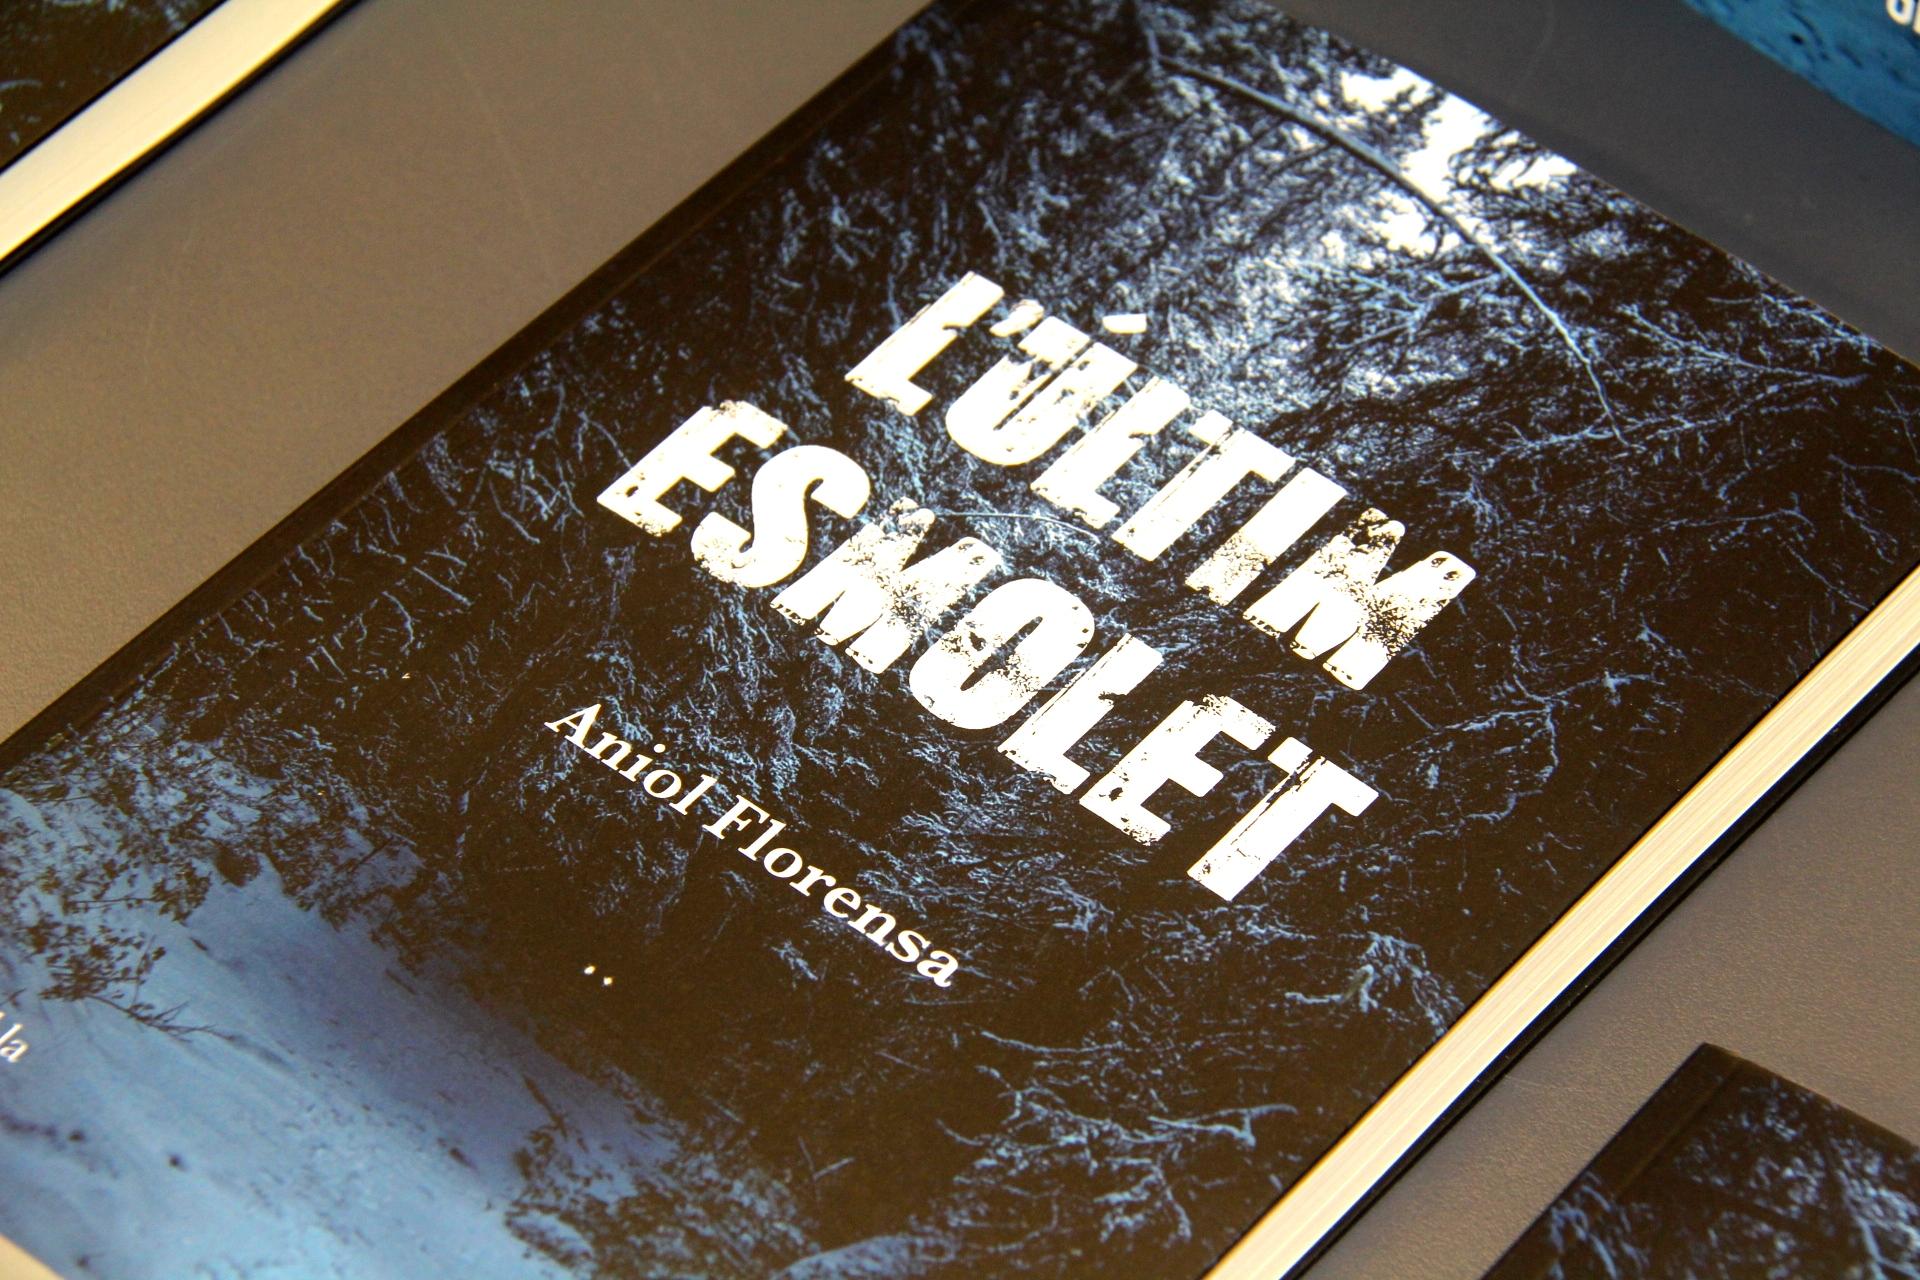 'L'últim esmolet' d'Aniol Florensa